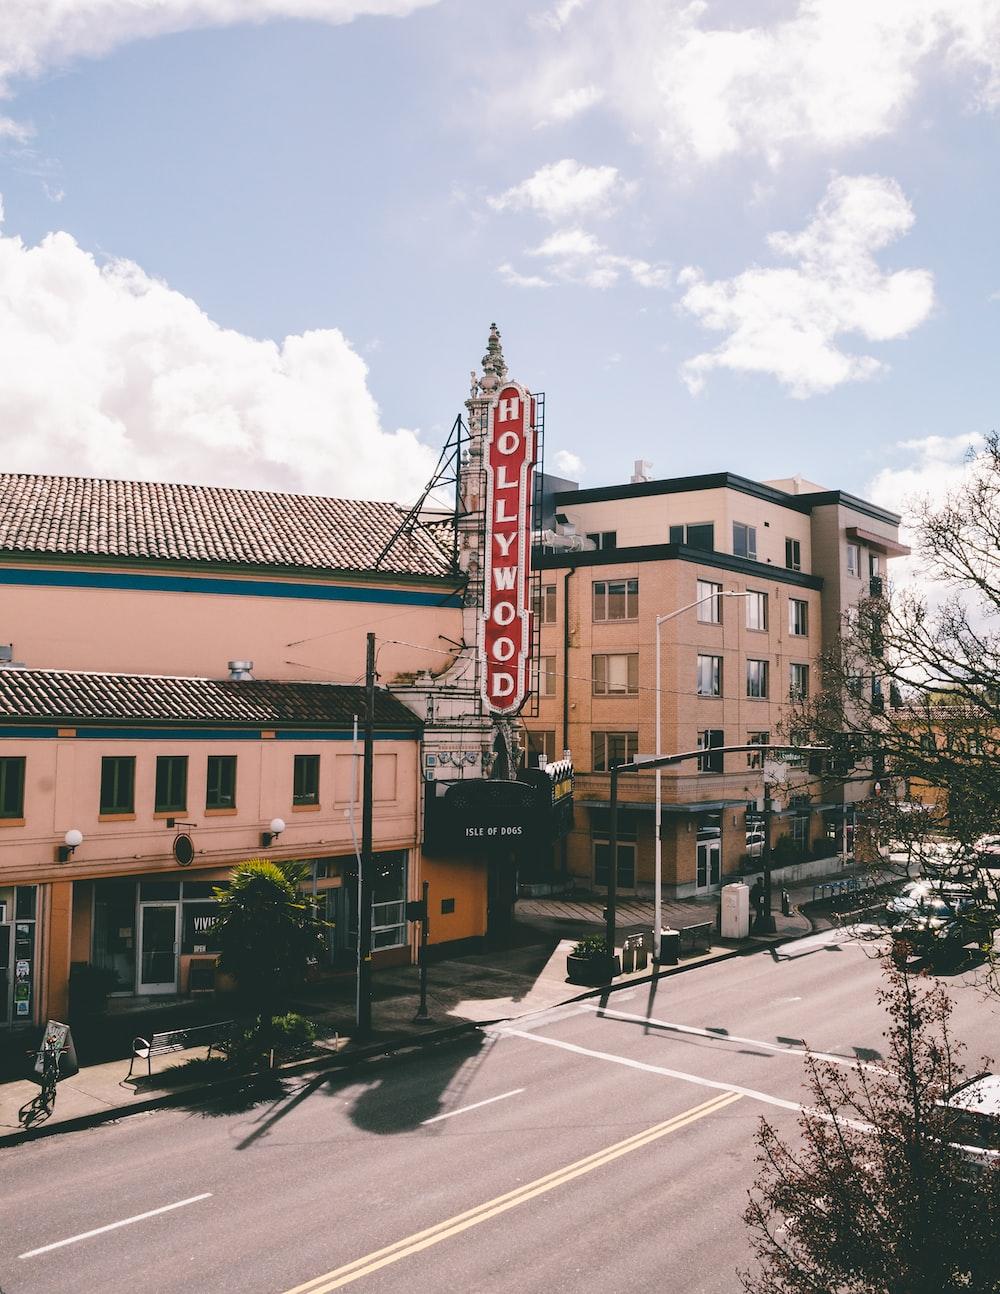 Hollywood storefront at daytime